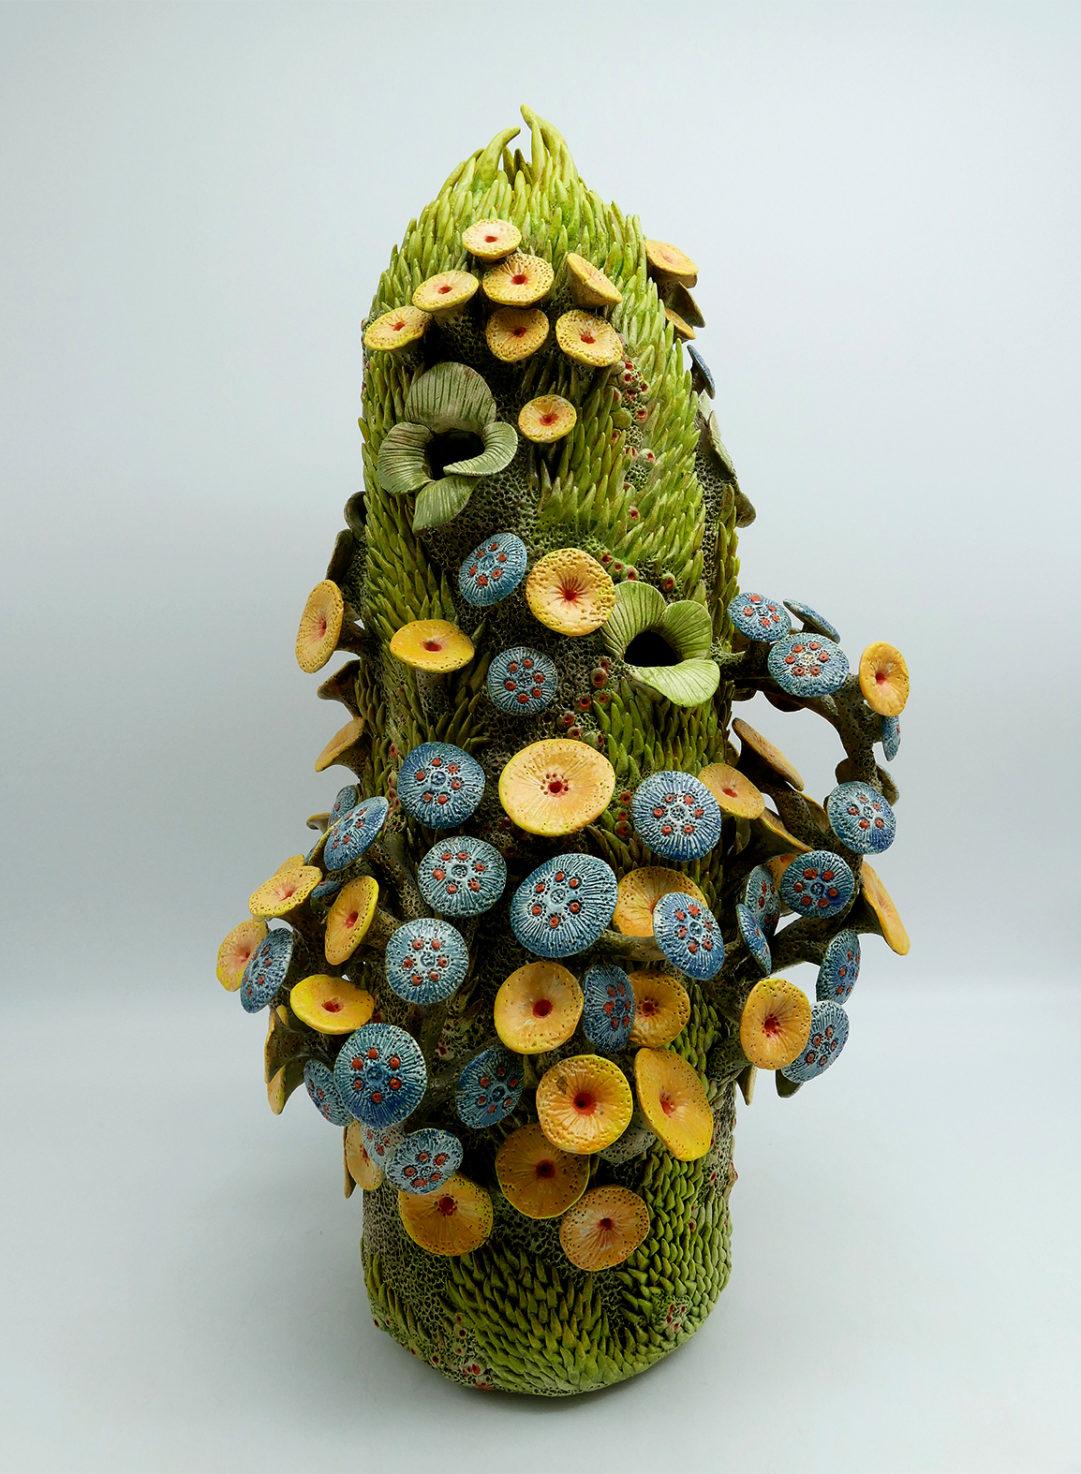 Muriel Persil, Forme végétale, faïence, 2018. 52H X 26Lcm.